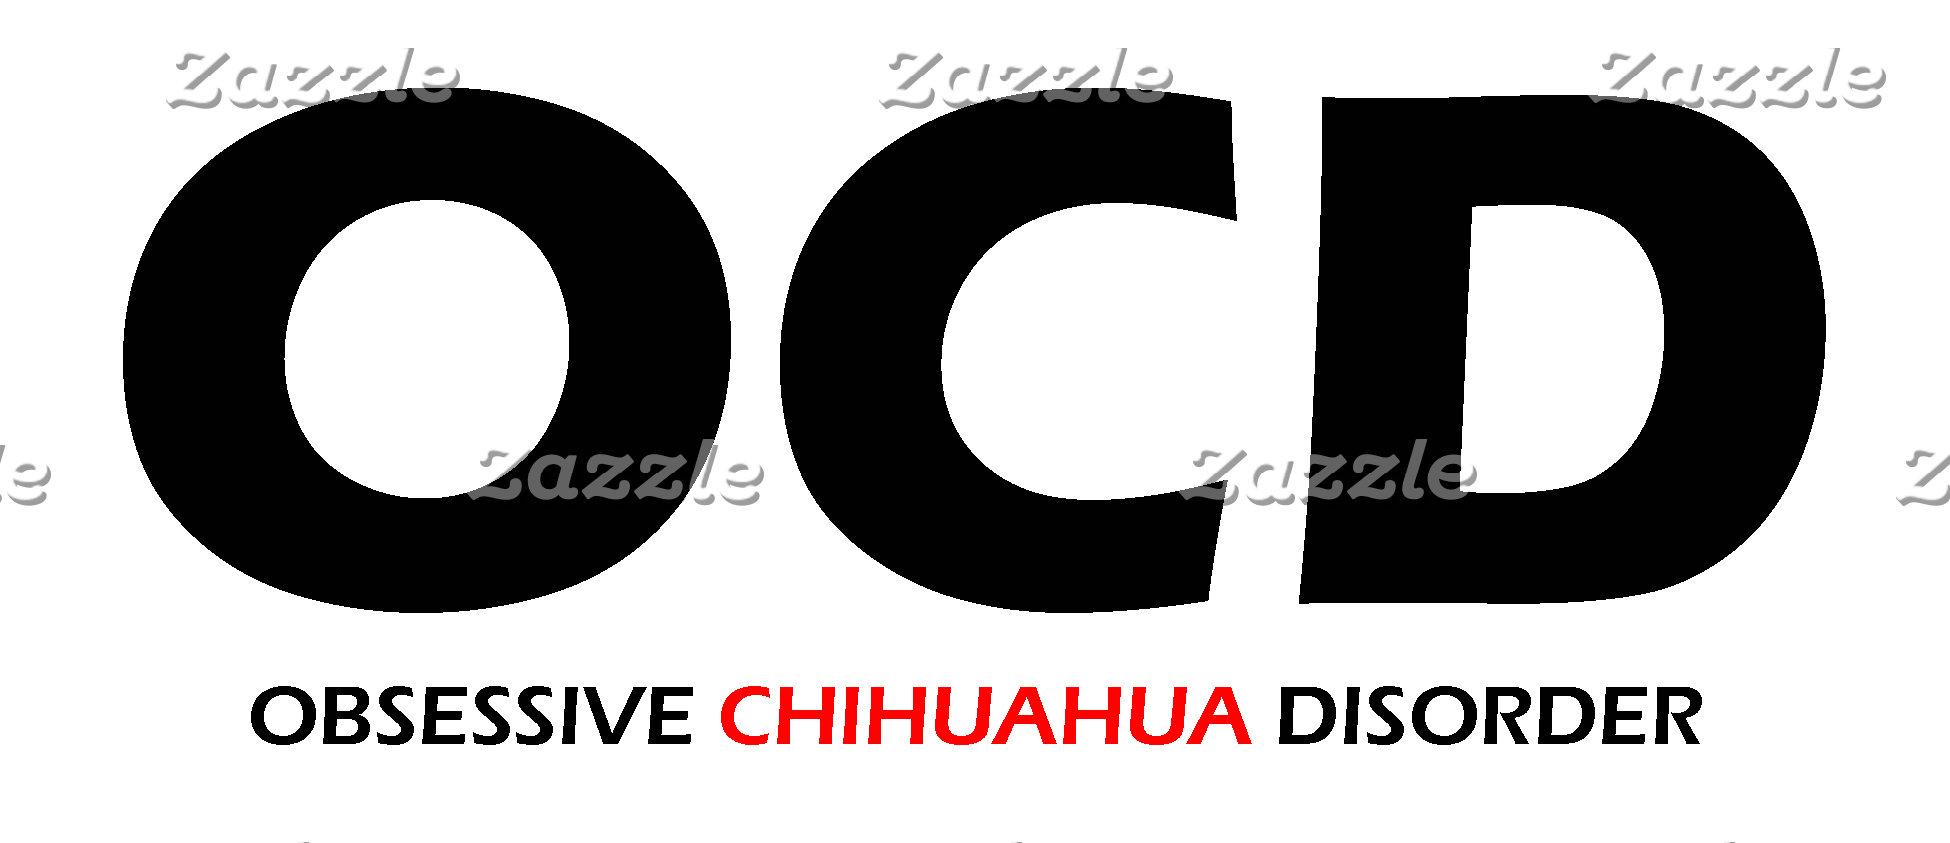 Obsessive Chihuahua Disorder